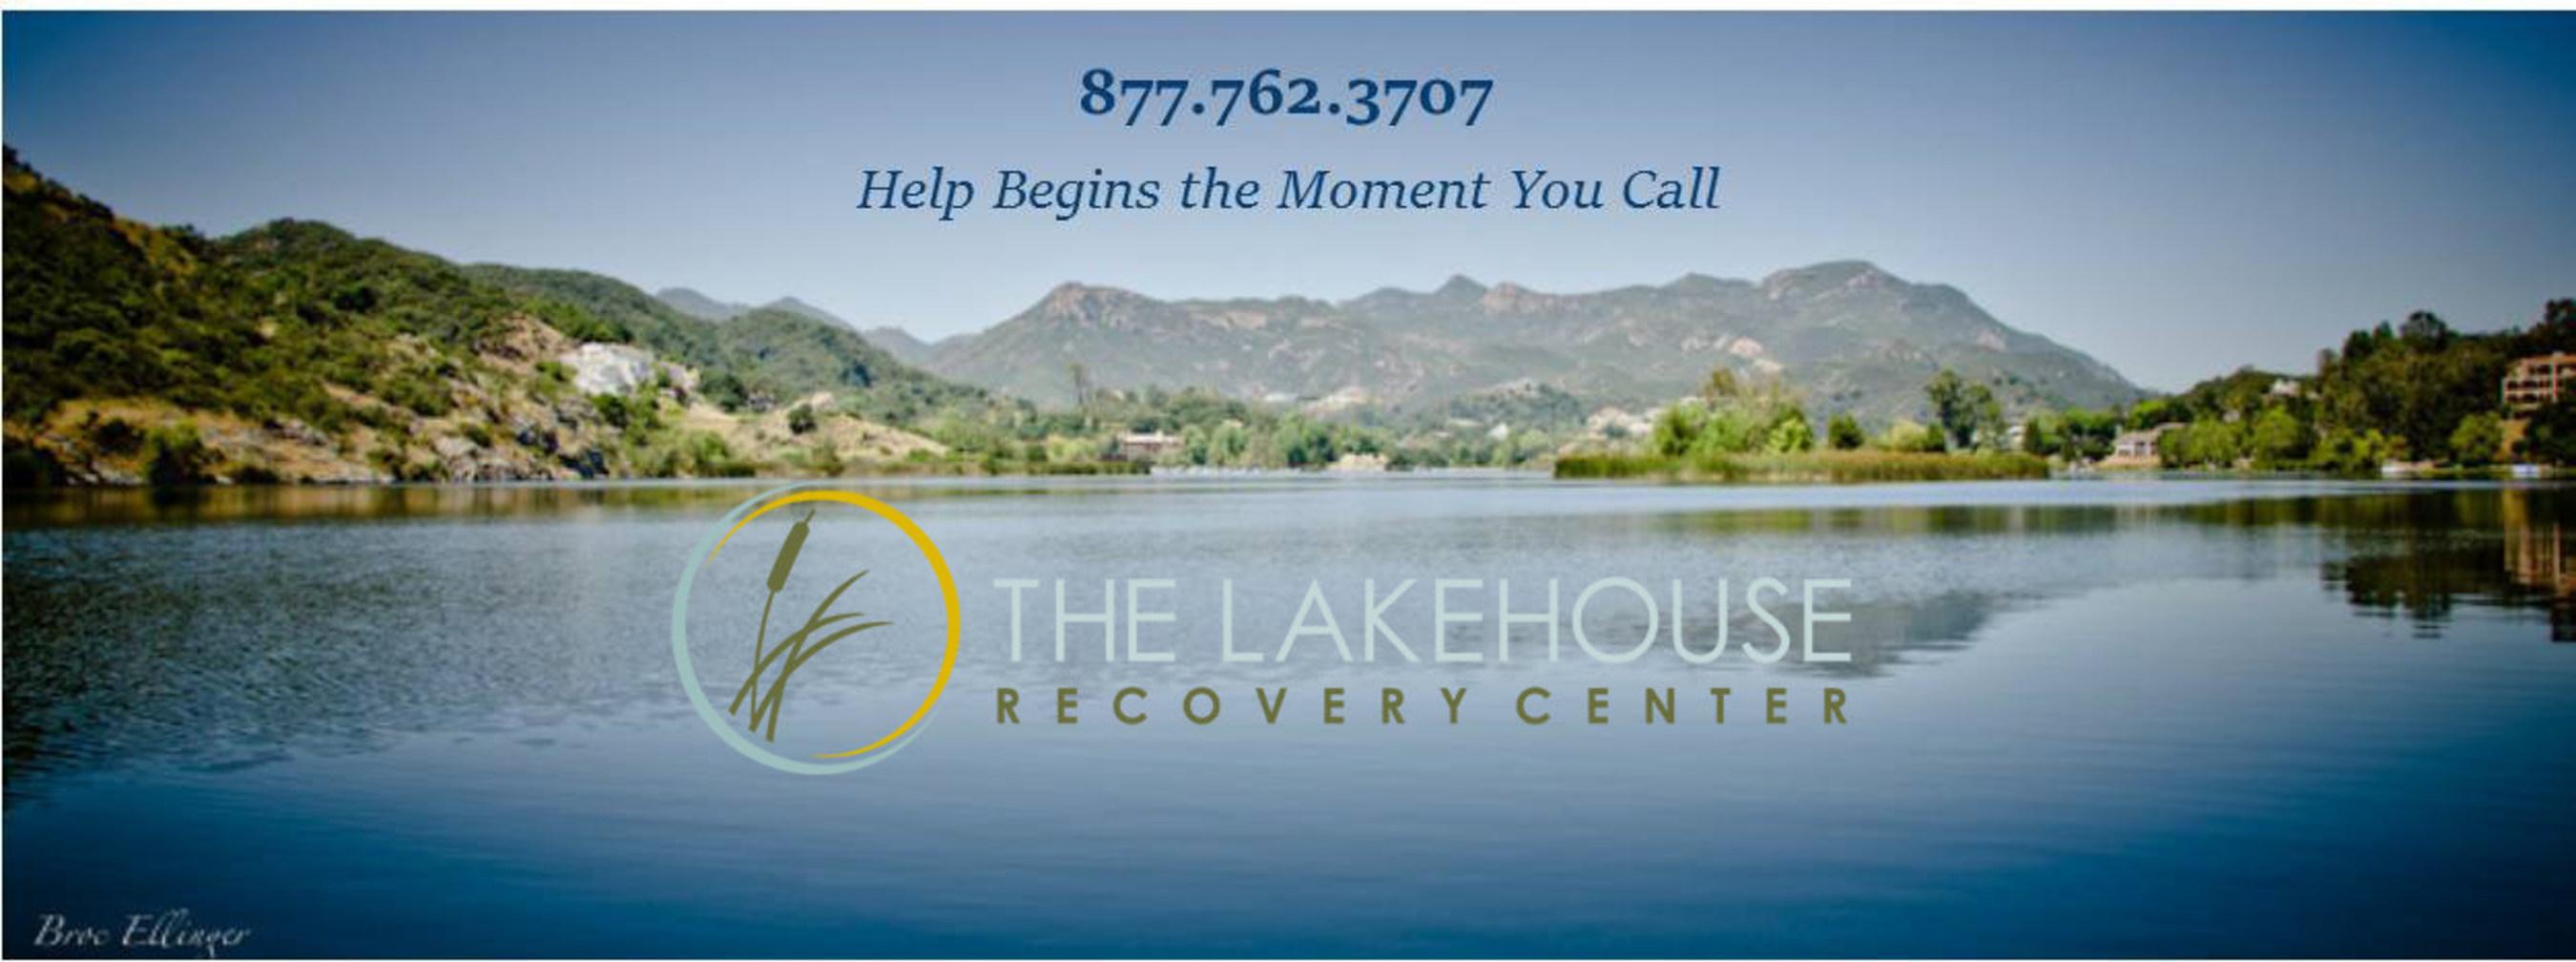 Los Angeles Drug Rehab Adds Humor to Addiction Treatment